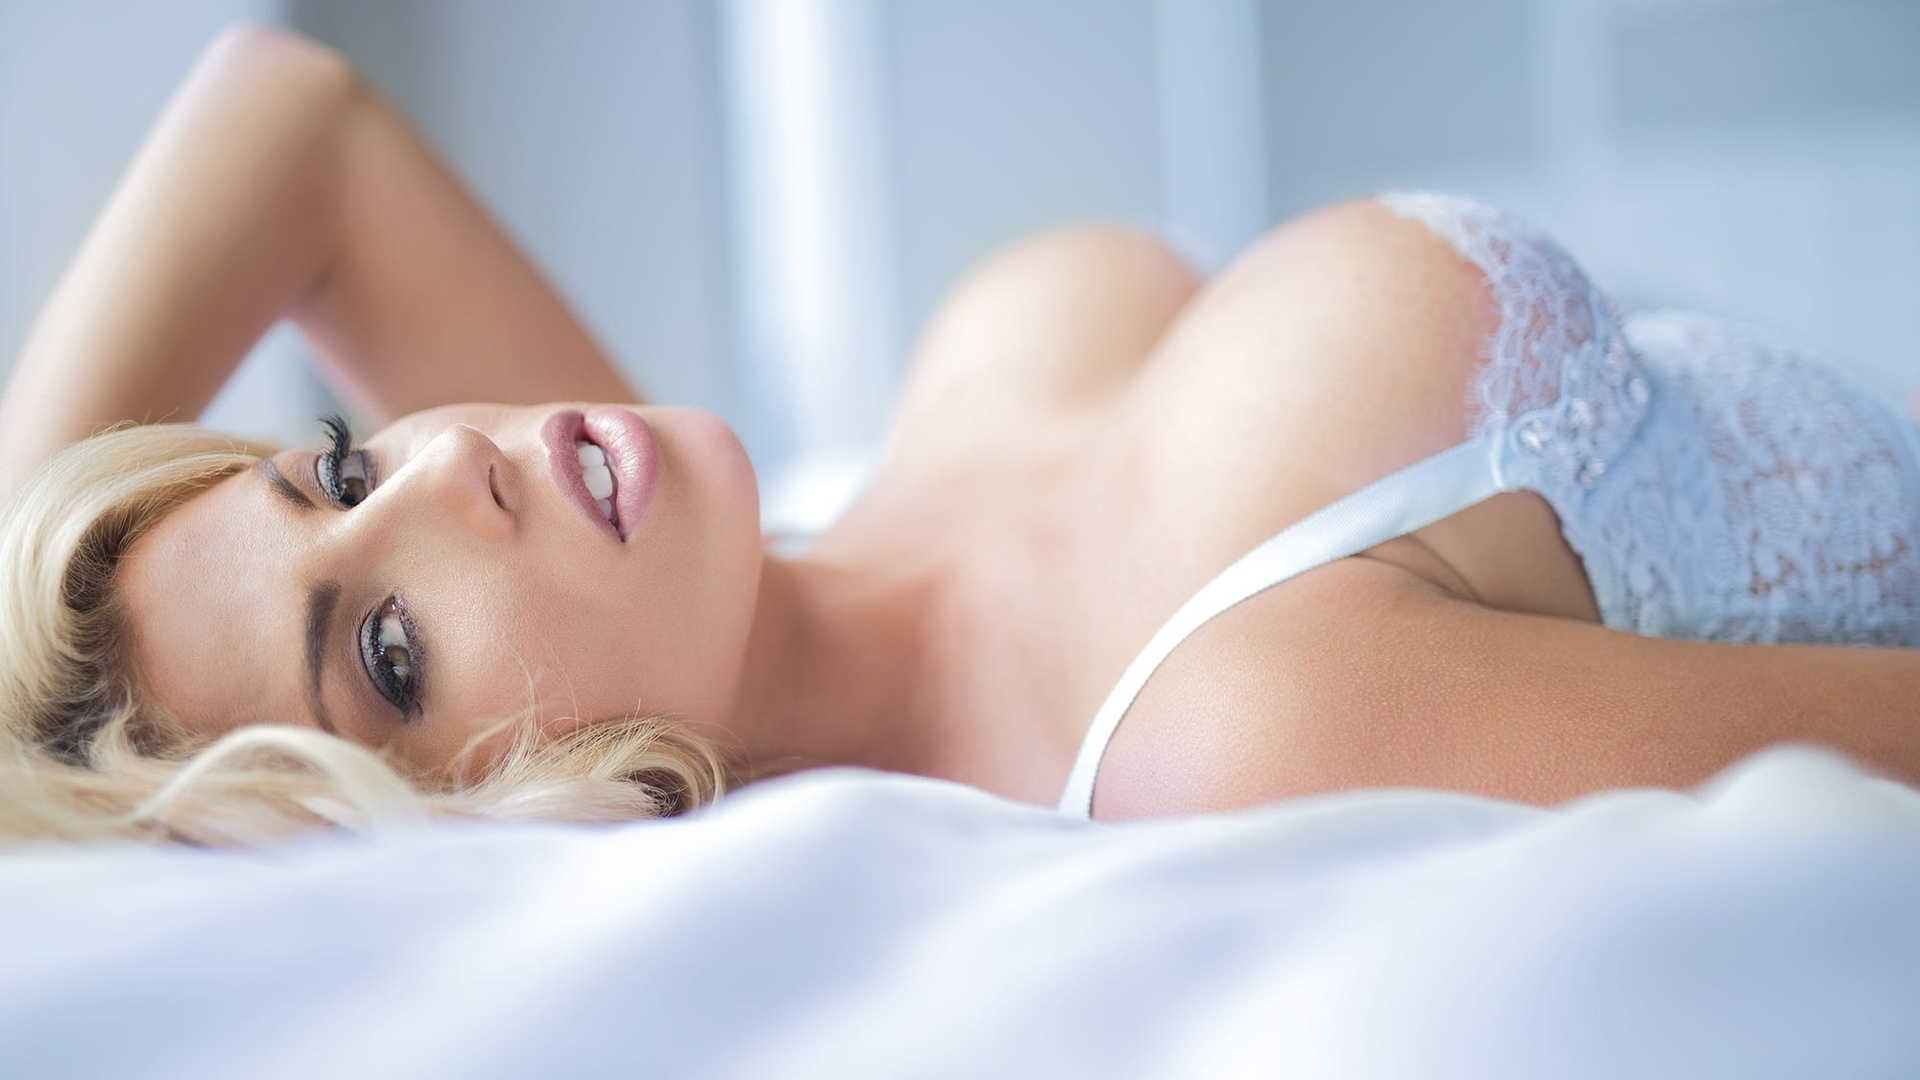 Женщины блондинки бюст